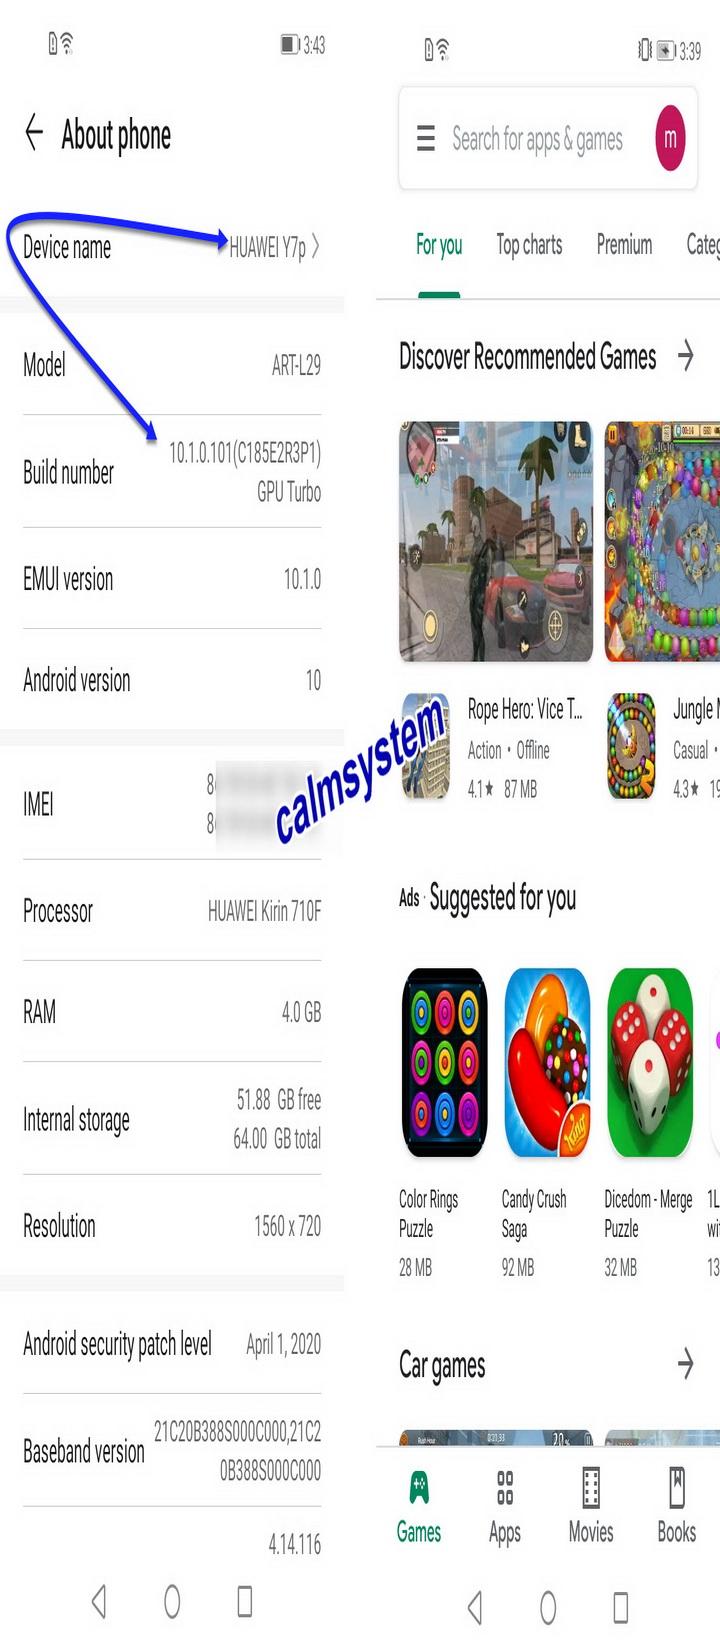 اضافت خدمات جوجل بلاي Huawei Y7P